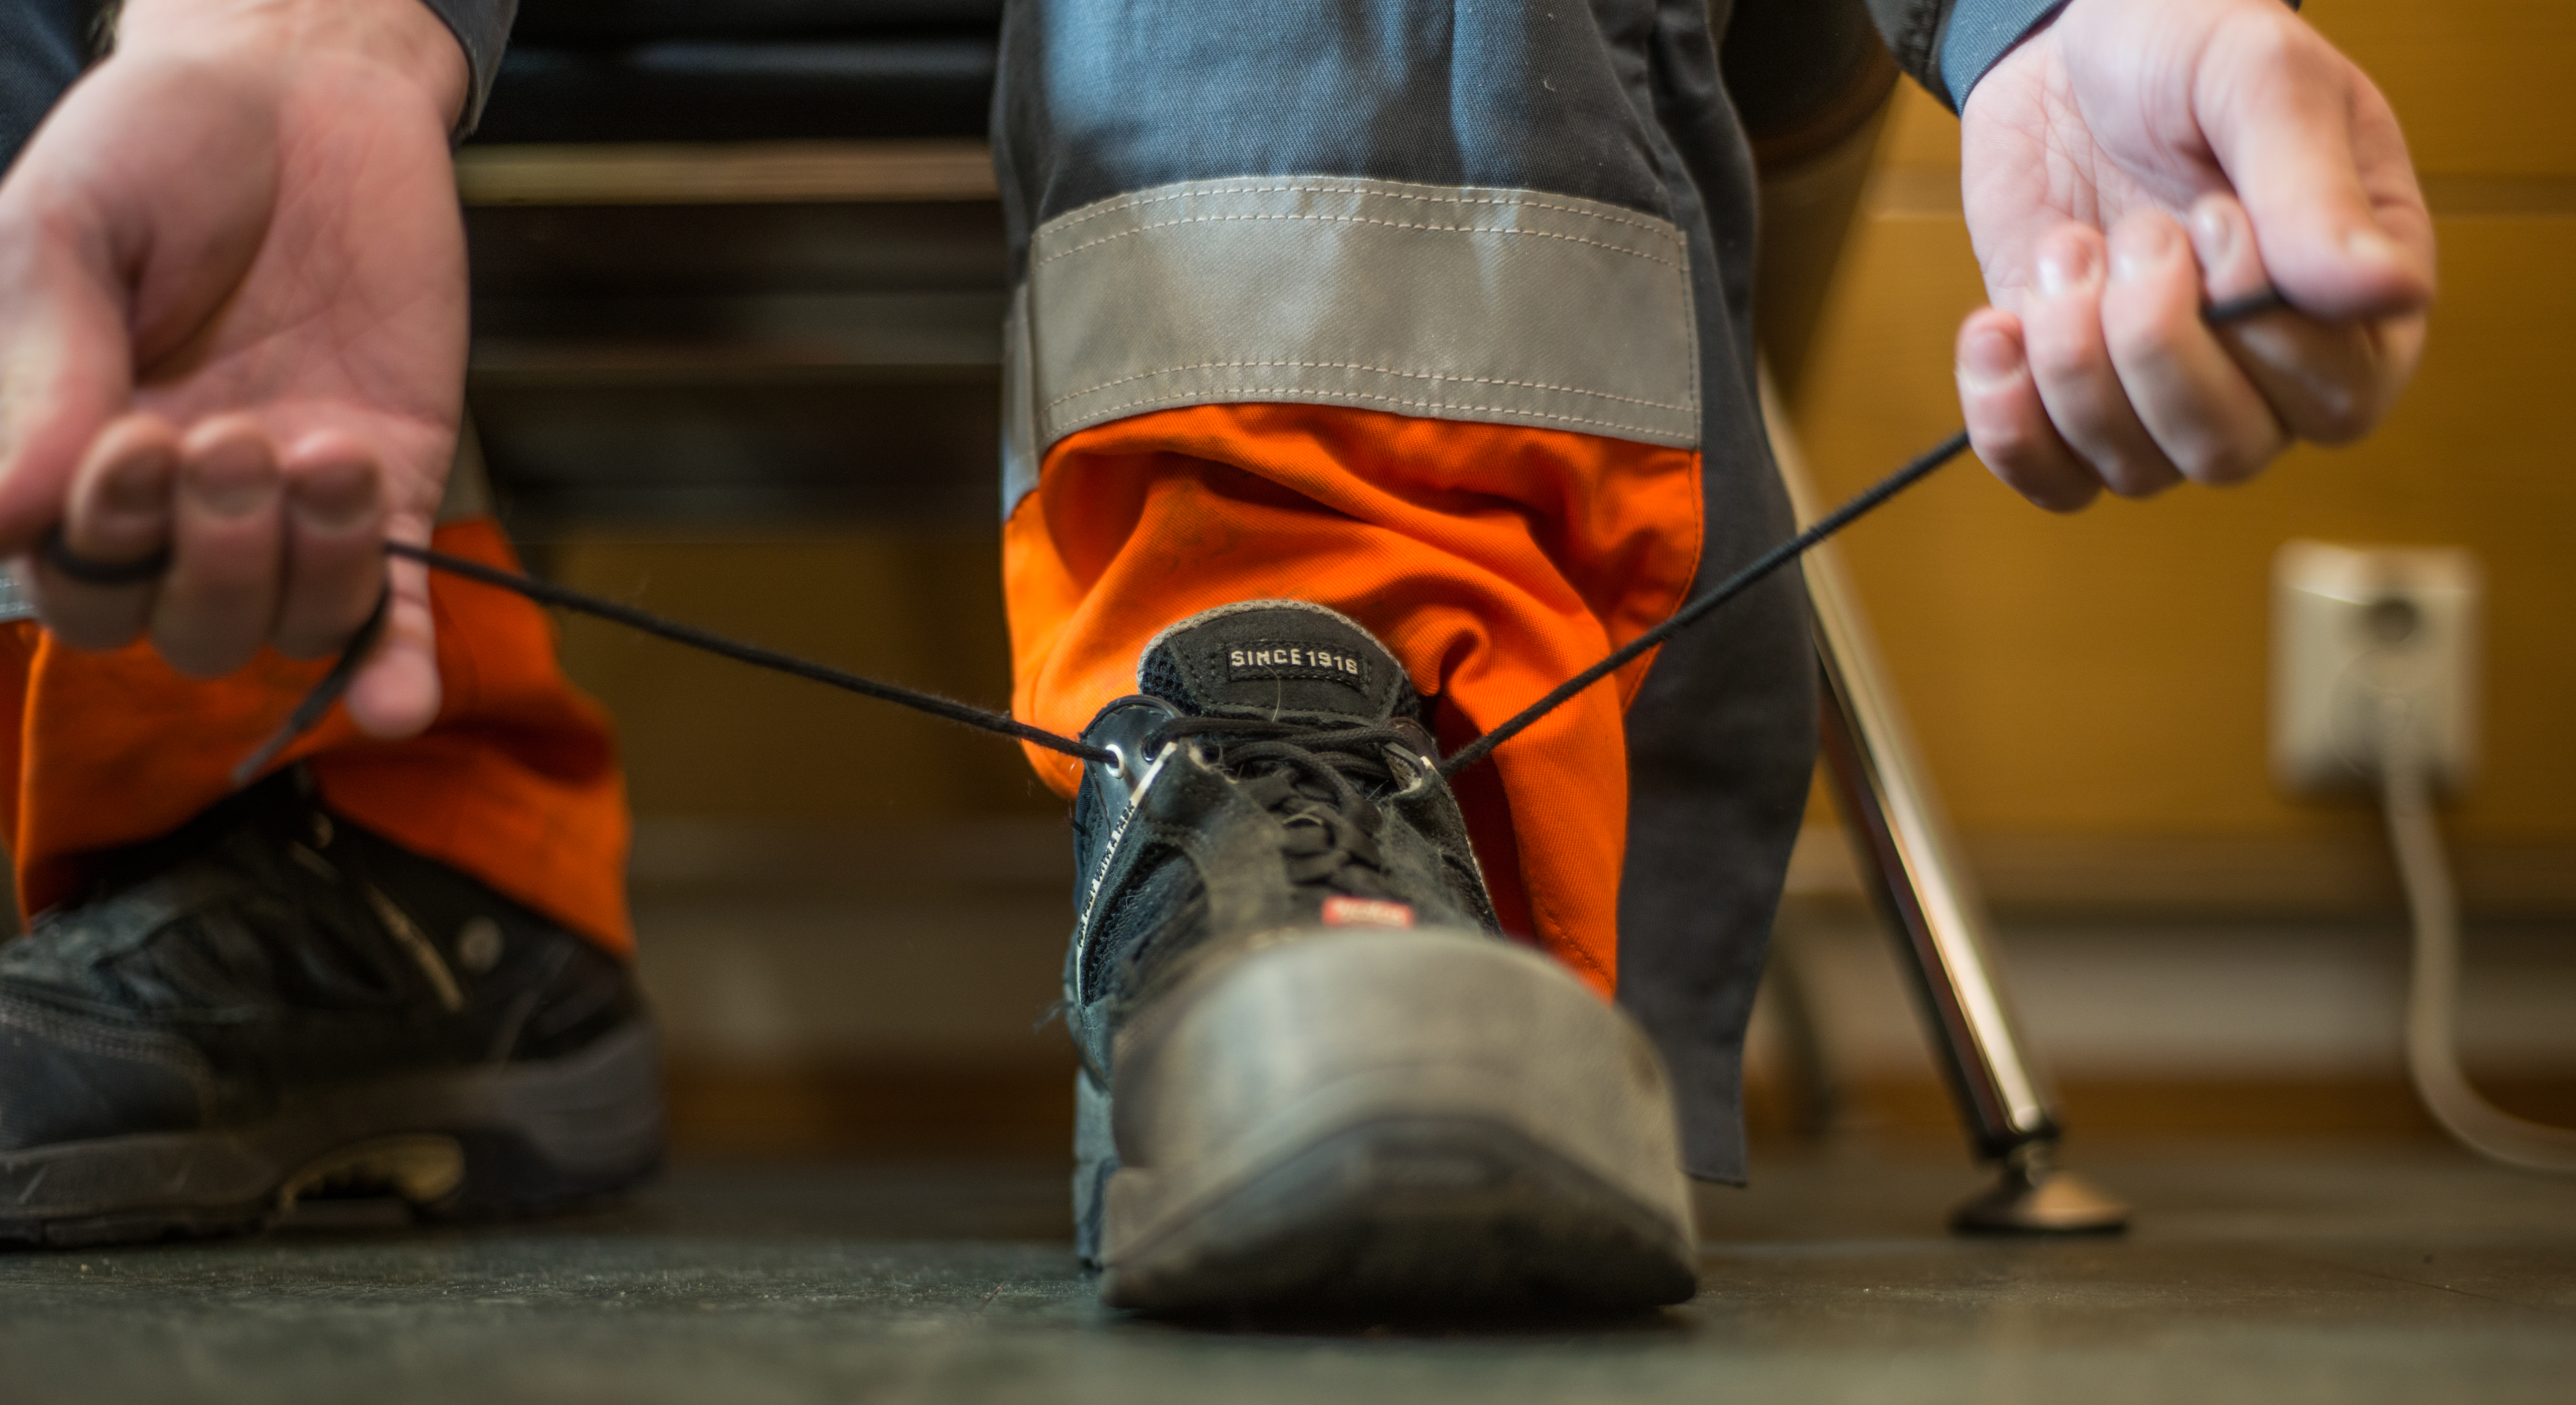 wartsila-field-service-engineers_wartsila-shaft-line-repair-services